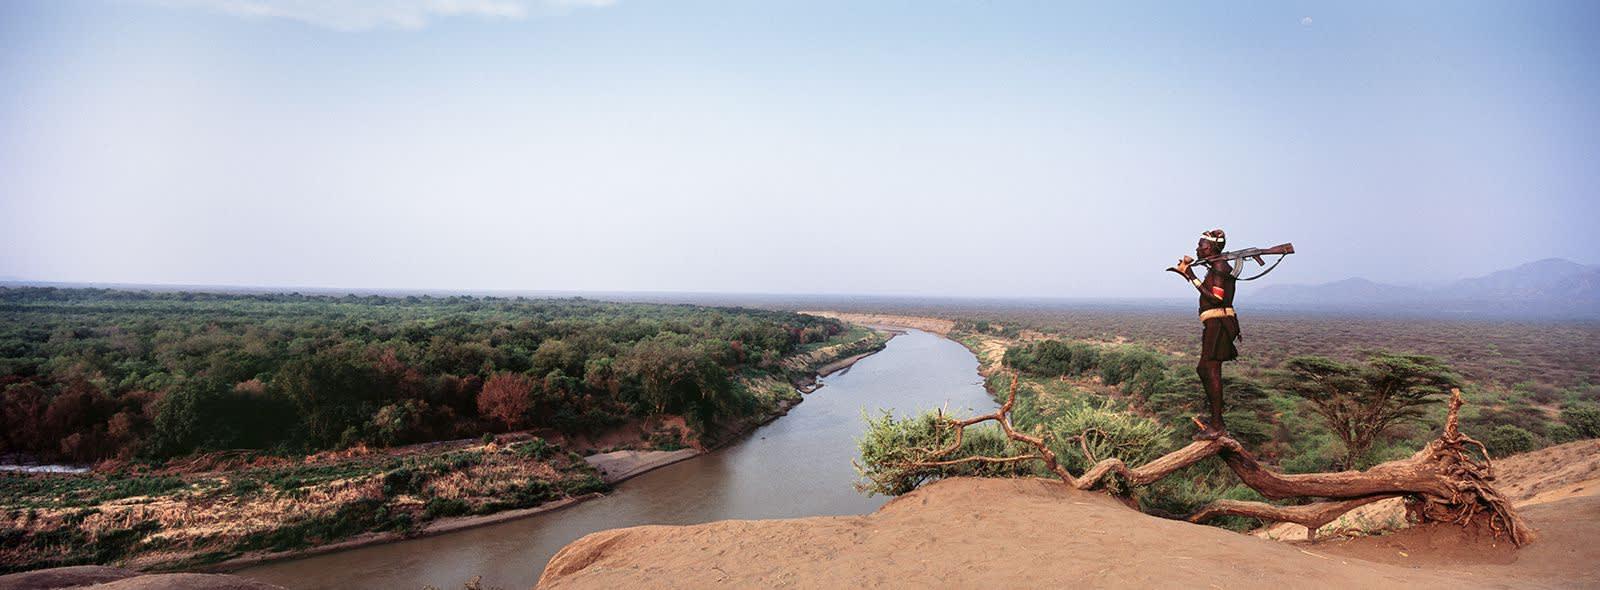 Matjaž Krivic, Omo Valley, Ethiopia, 2002 – 2006